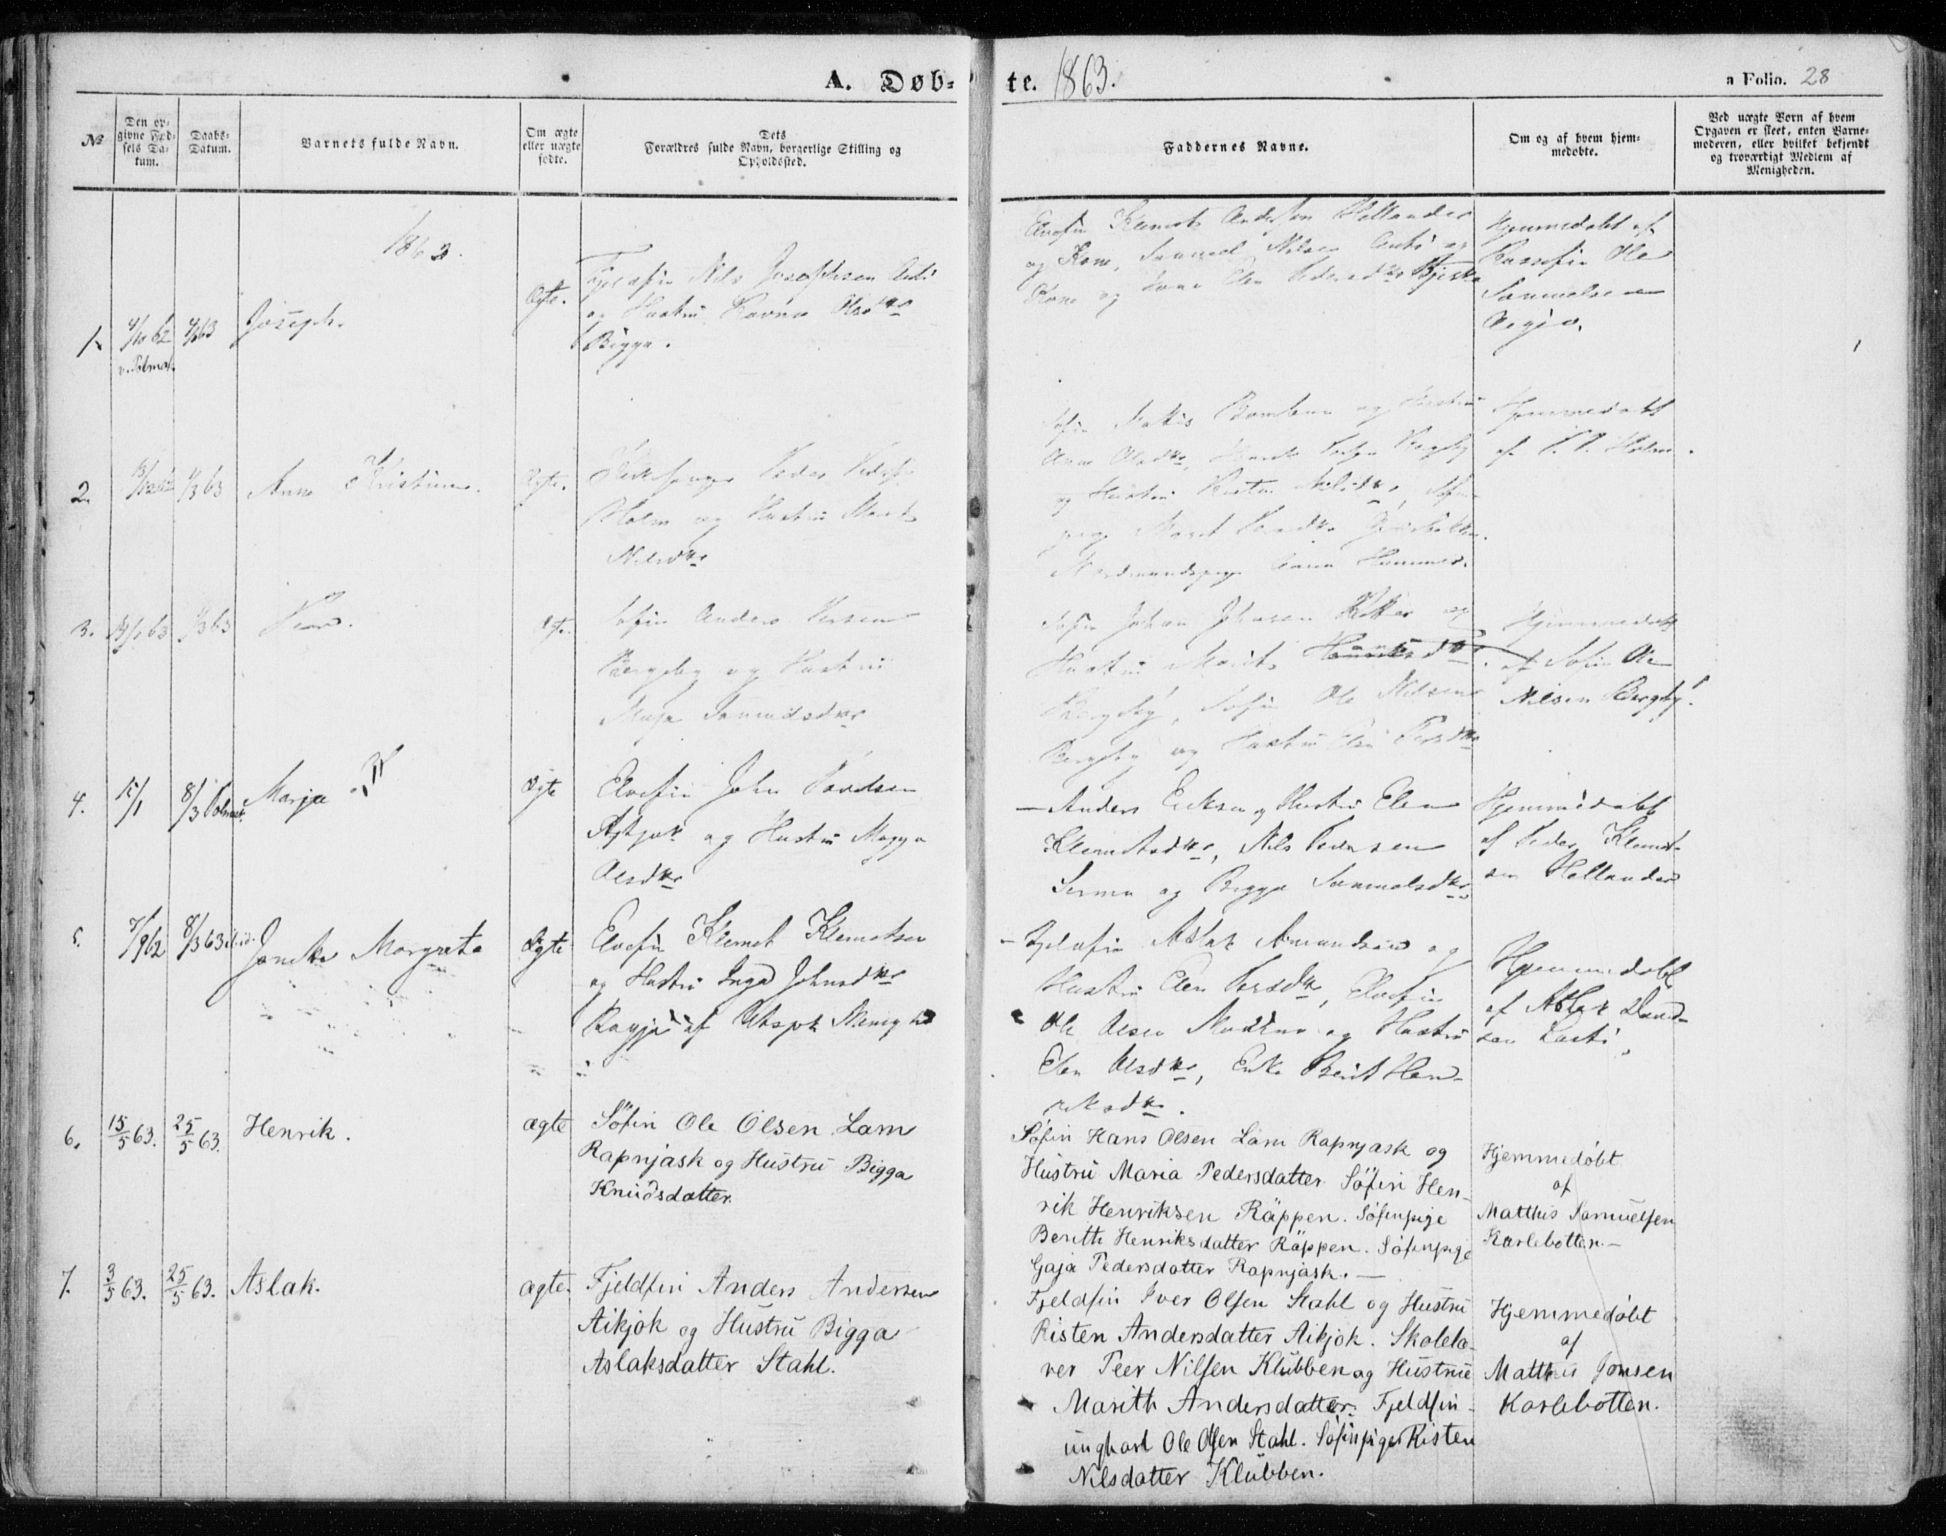 SATØ, Nesseby sokneprestkontor, H/Ha/L0002kirke: Ministerialbok nr. 2, 1856-1864, s. 28